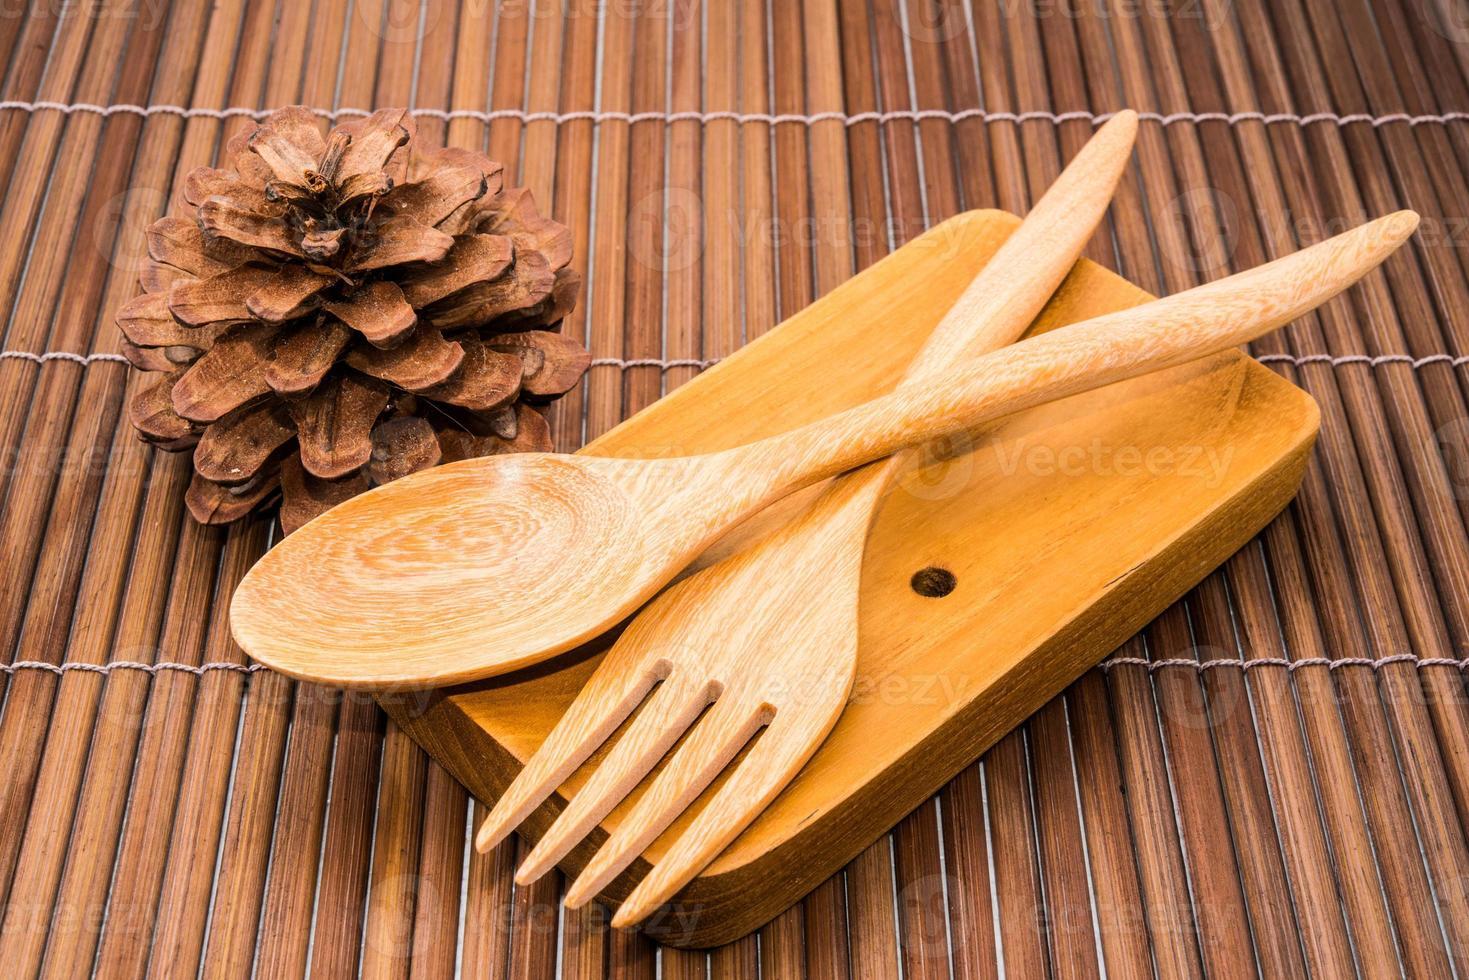 cuillère en bois photo